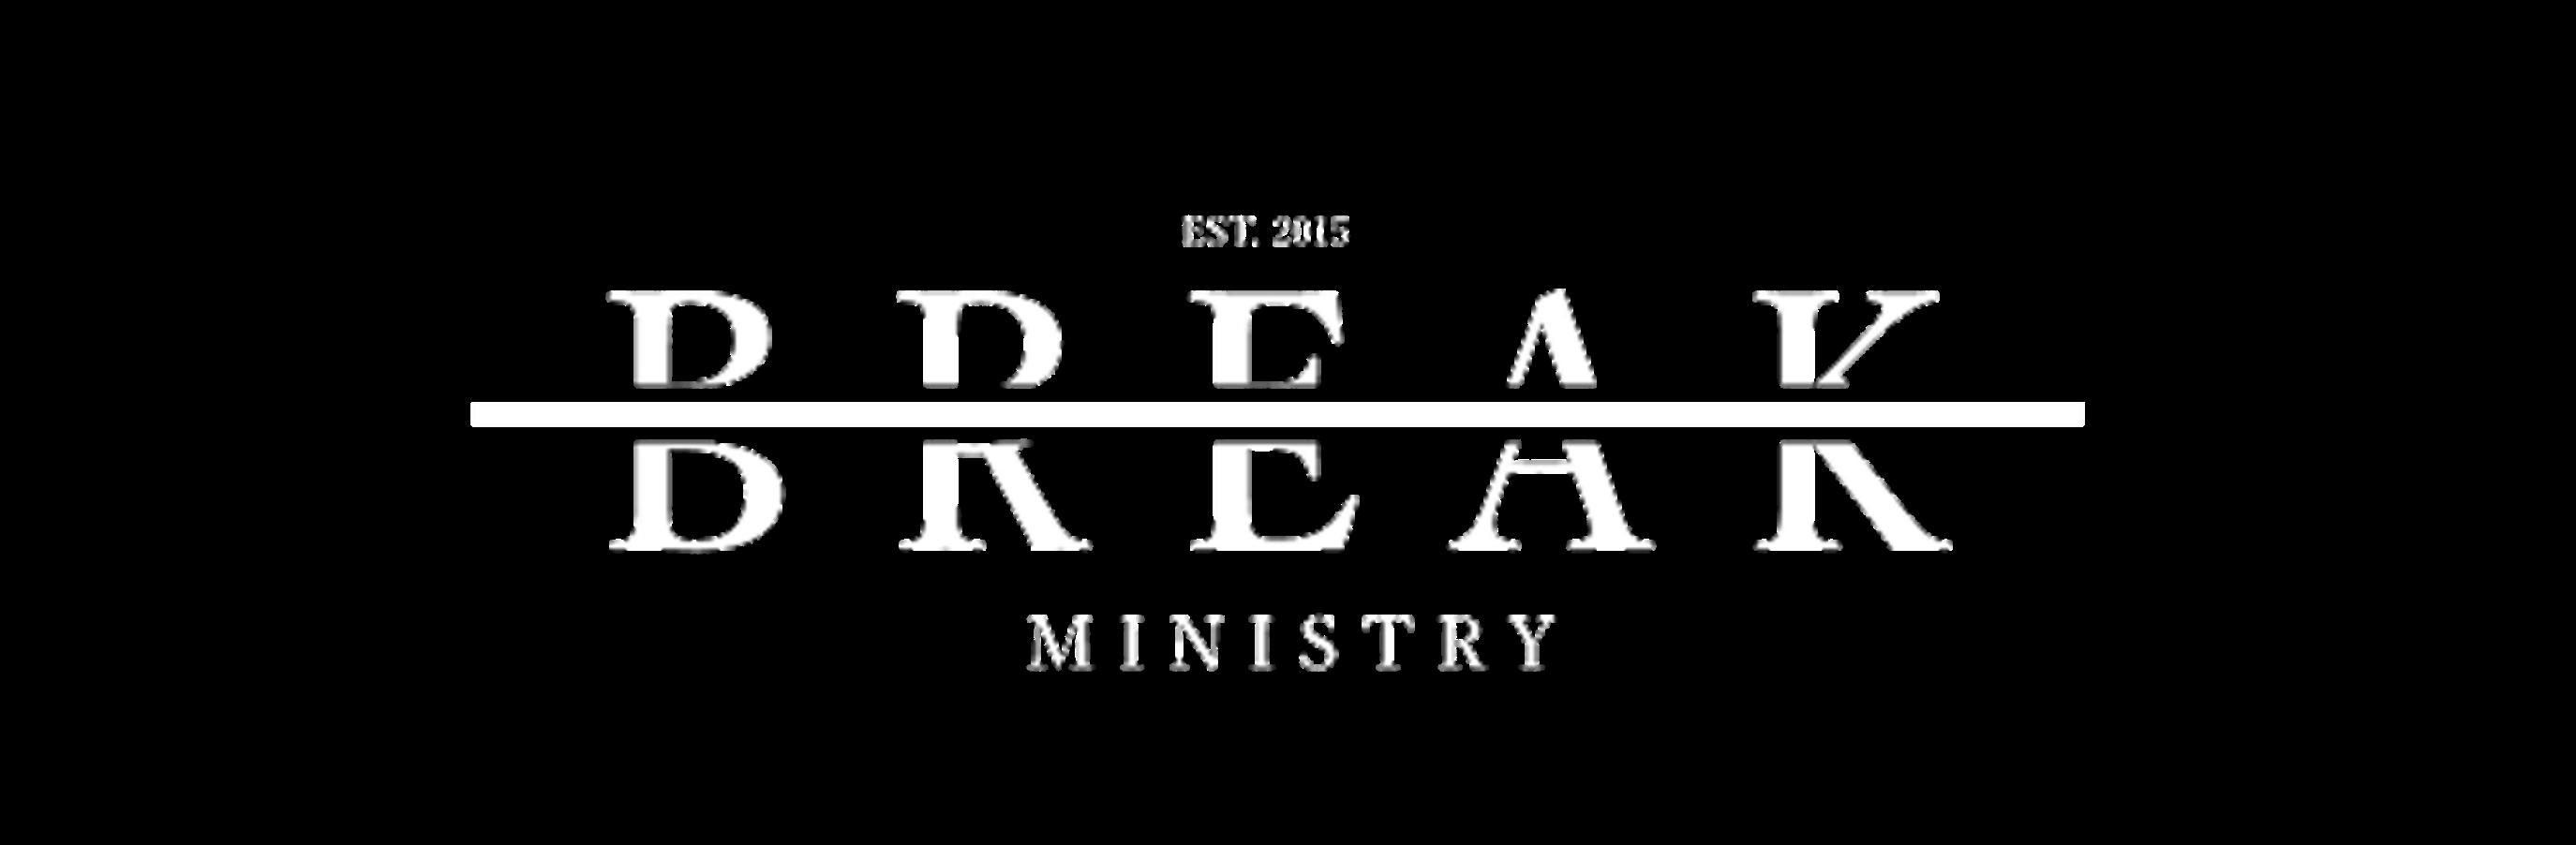 Break Ministry